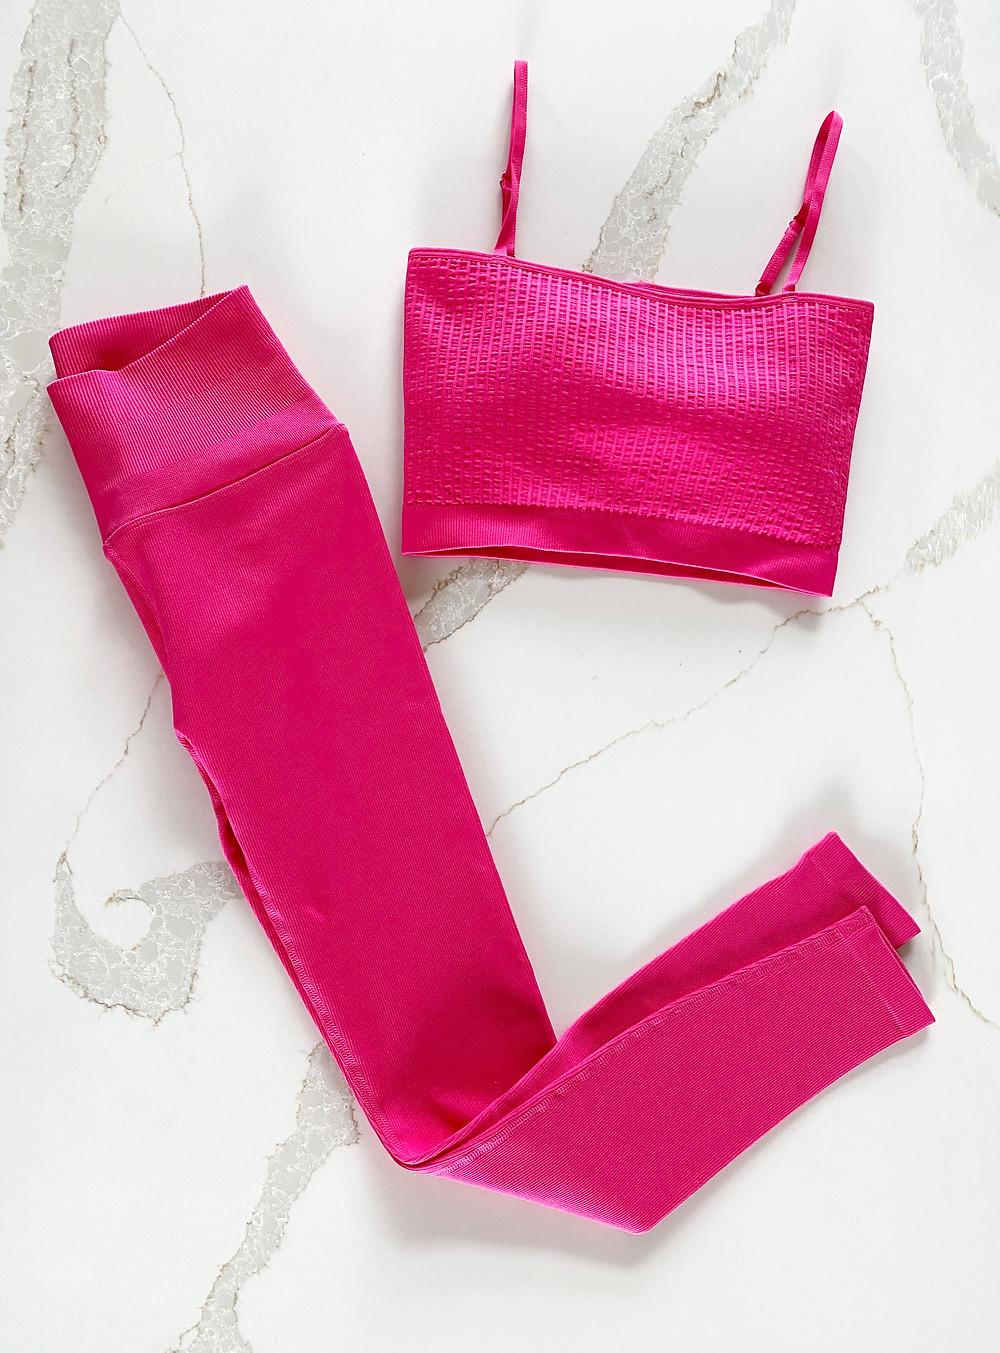 Yoga Fashion - Best Bra & Legging Sets 2021 Spiritual Gangster's Wide Rib Bandeau Cami and Love Sculpt Seamless Leggings